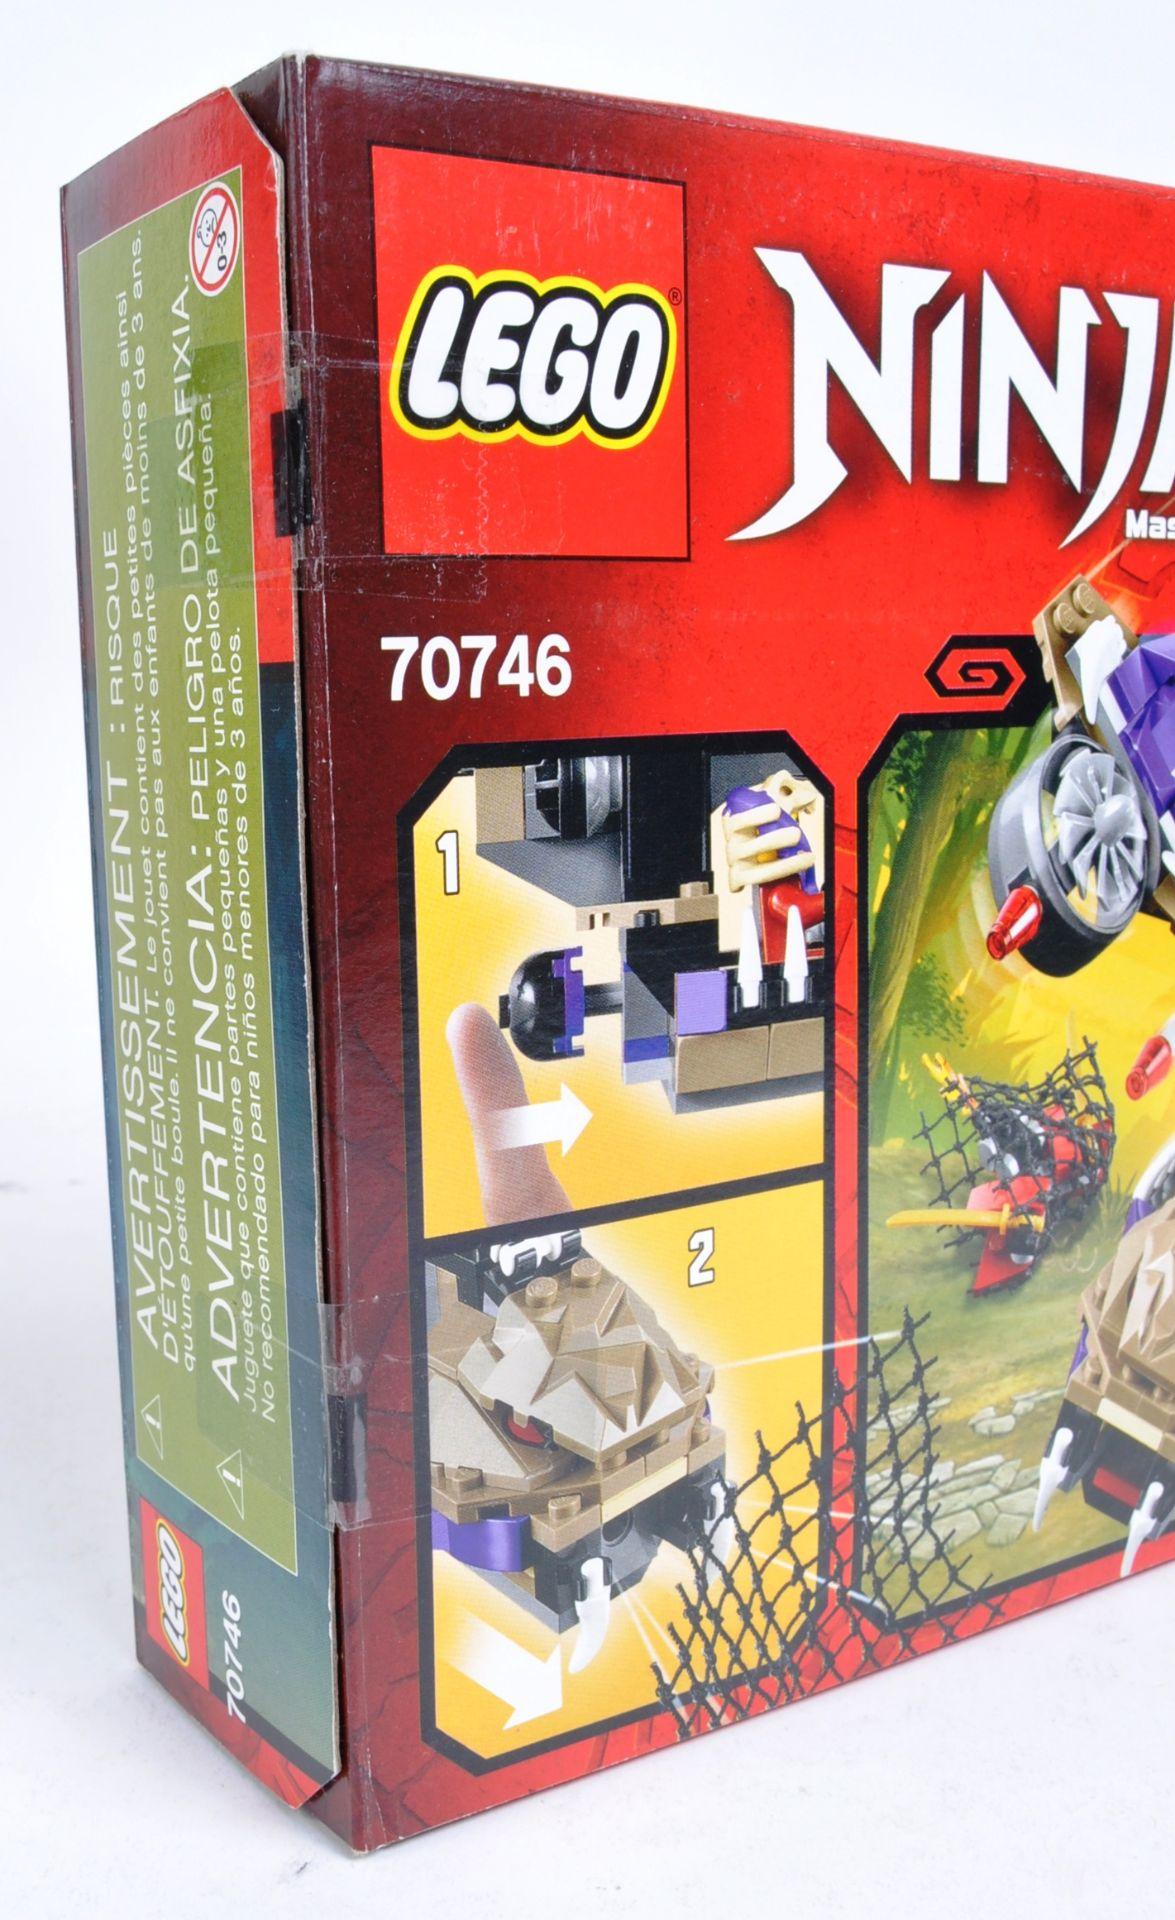 LEGO SETS - LEGO NINJAGO - 70589 / 70592 / 70746 / 70748 - Image 3 of 10